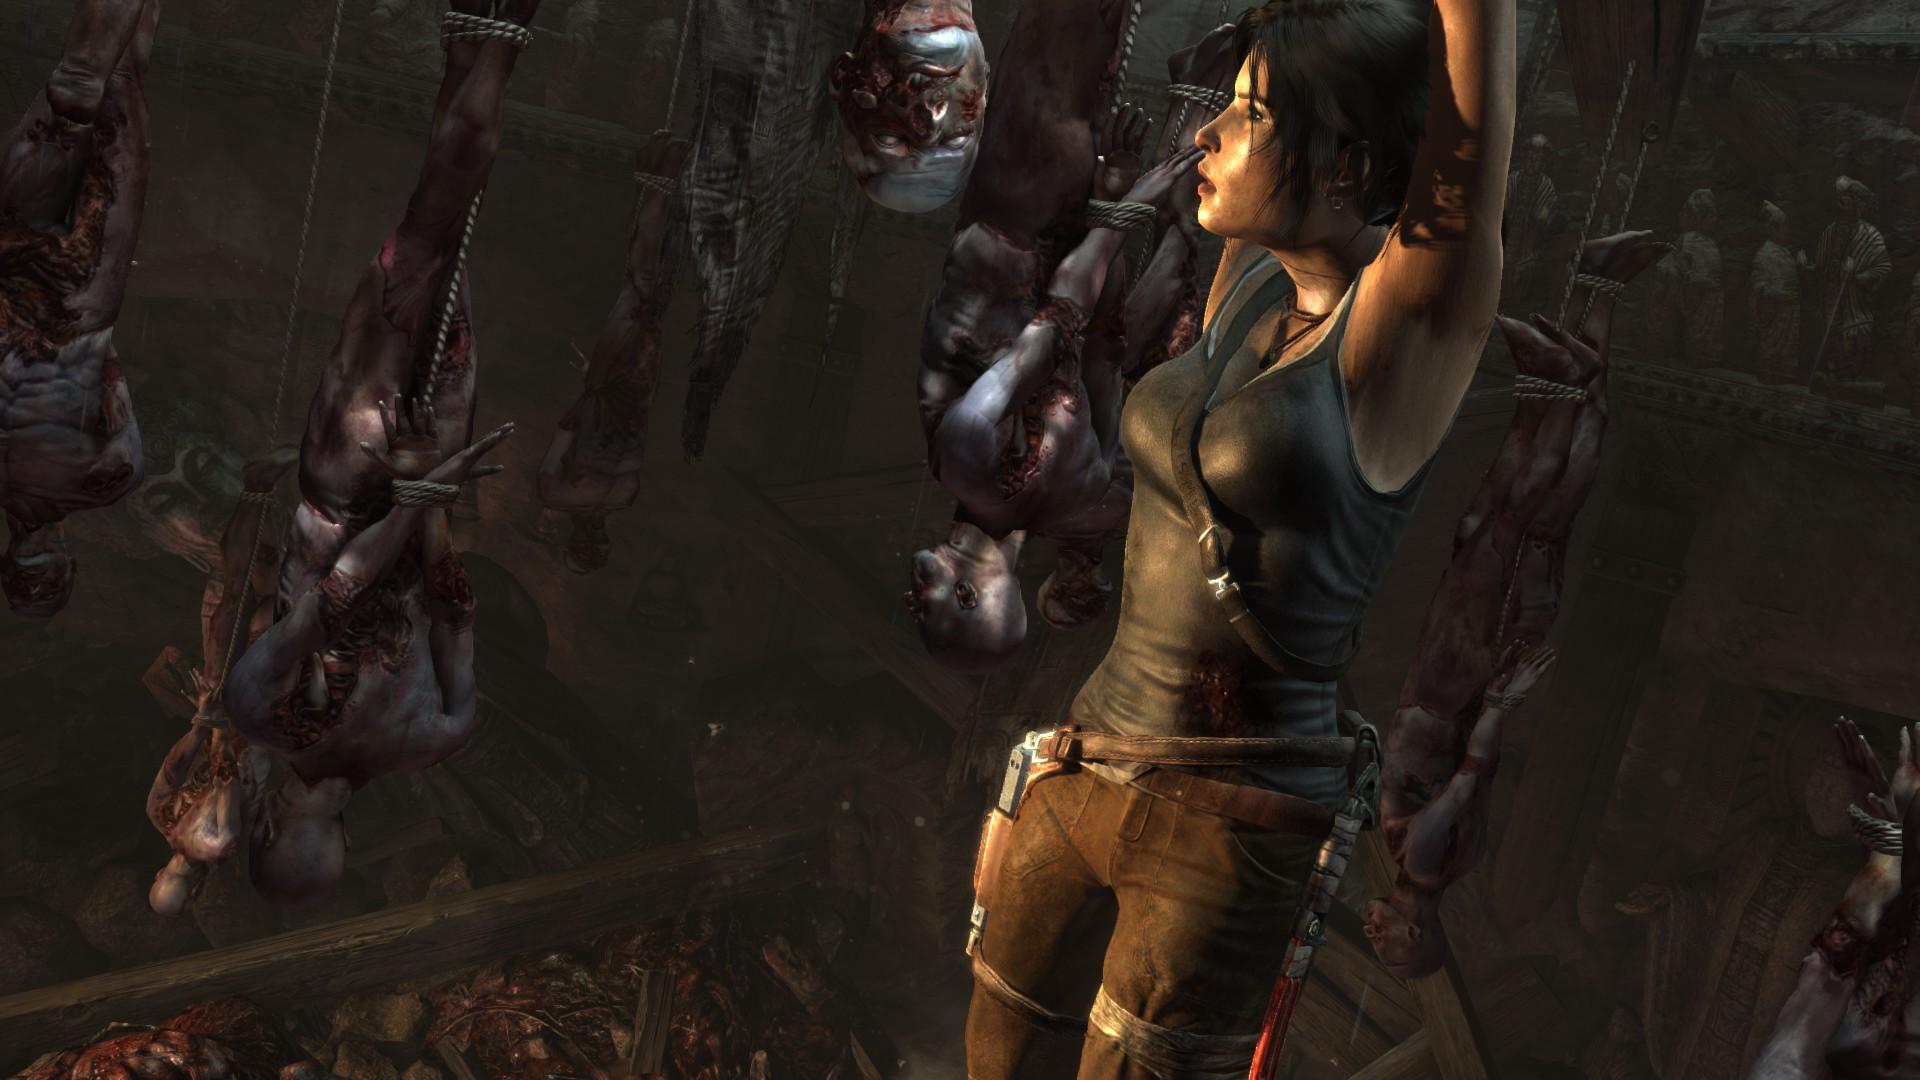 Tomb Raider Computer Wallpapers Desktop Backgrounds 1920x1080 Id 1920x1080